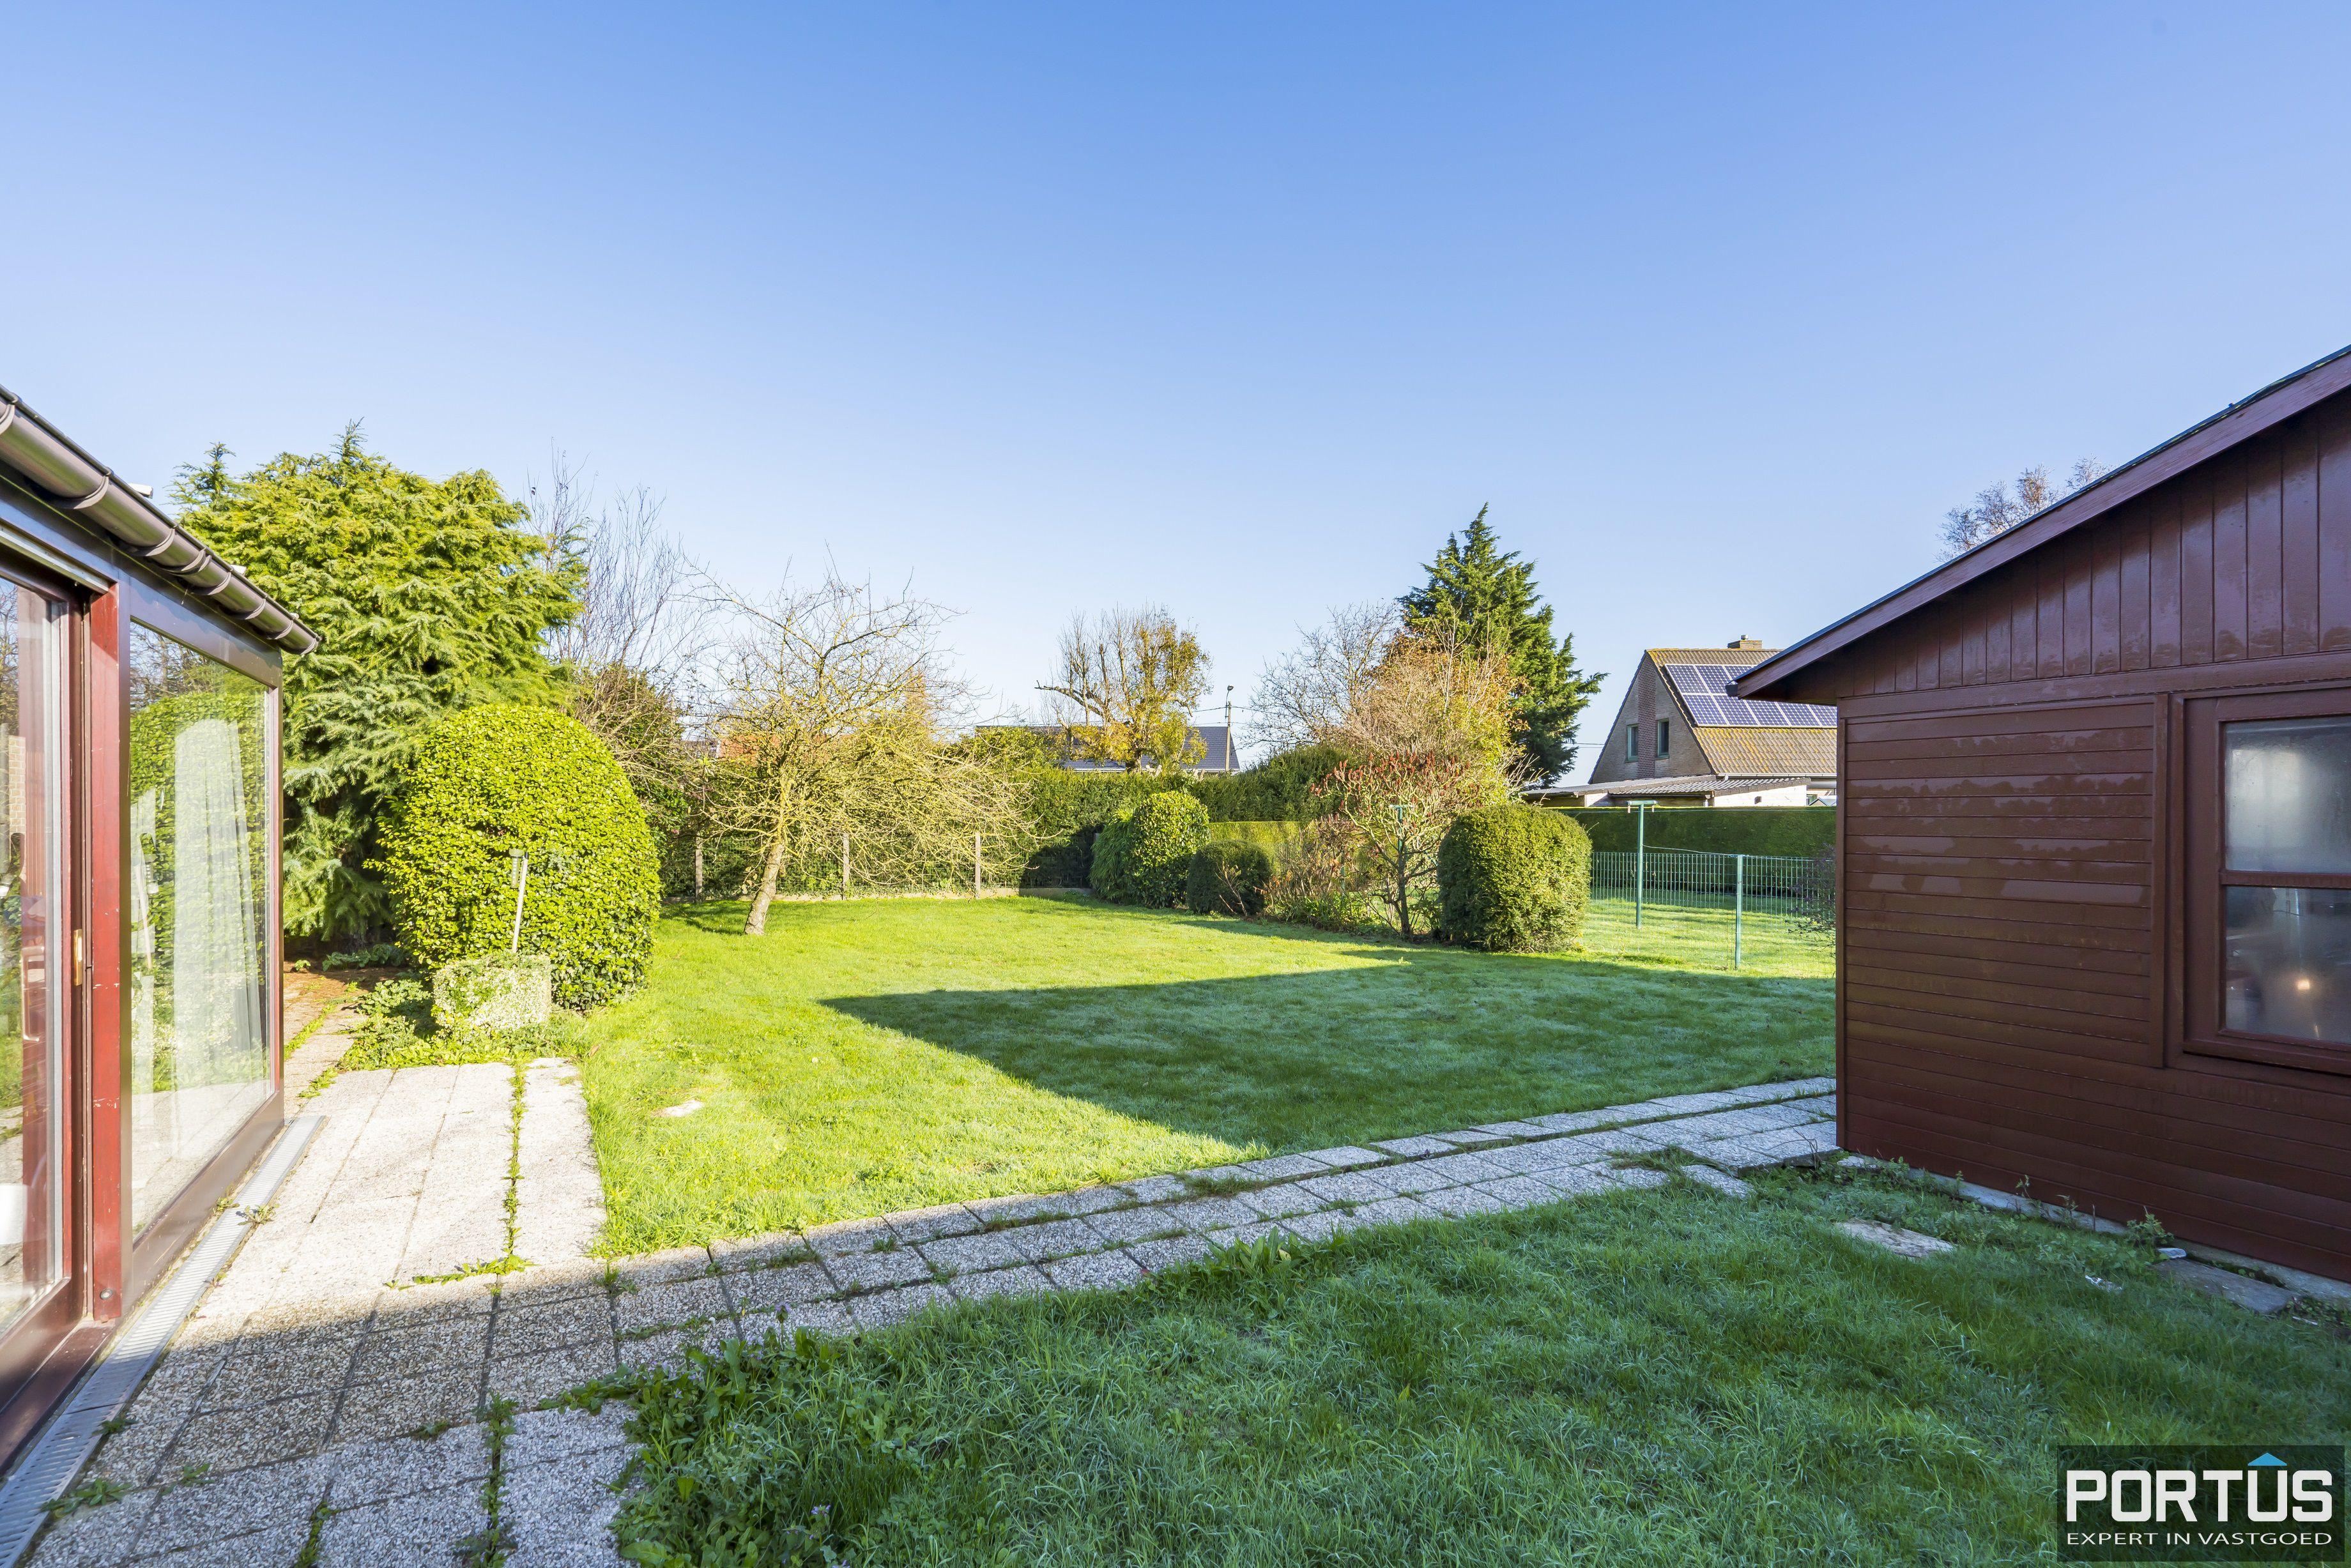 Woning te koop te Pervijze met grote tuin. - 12077